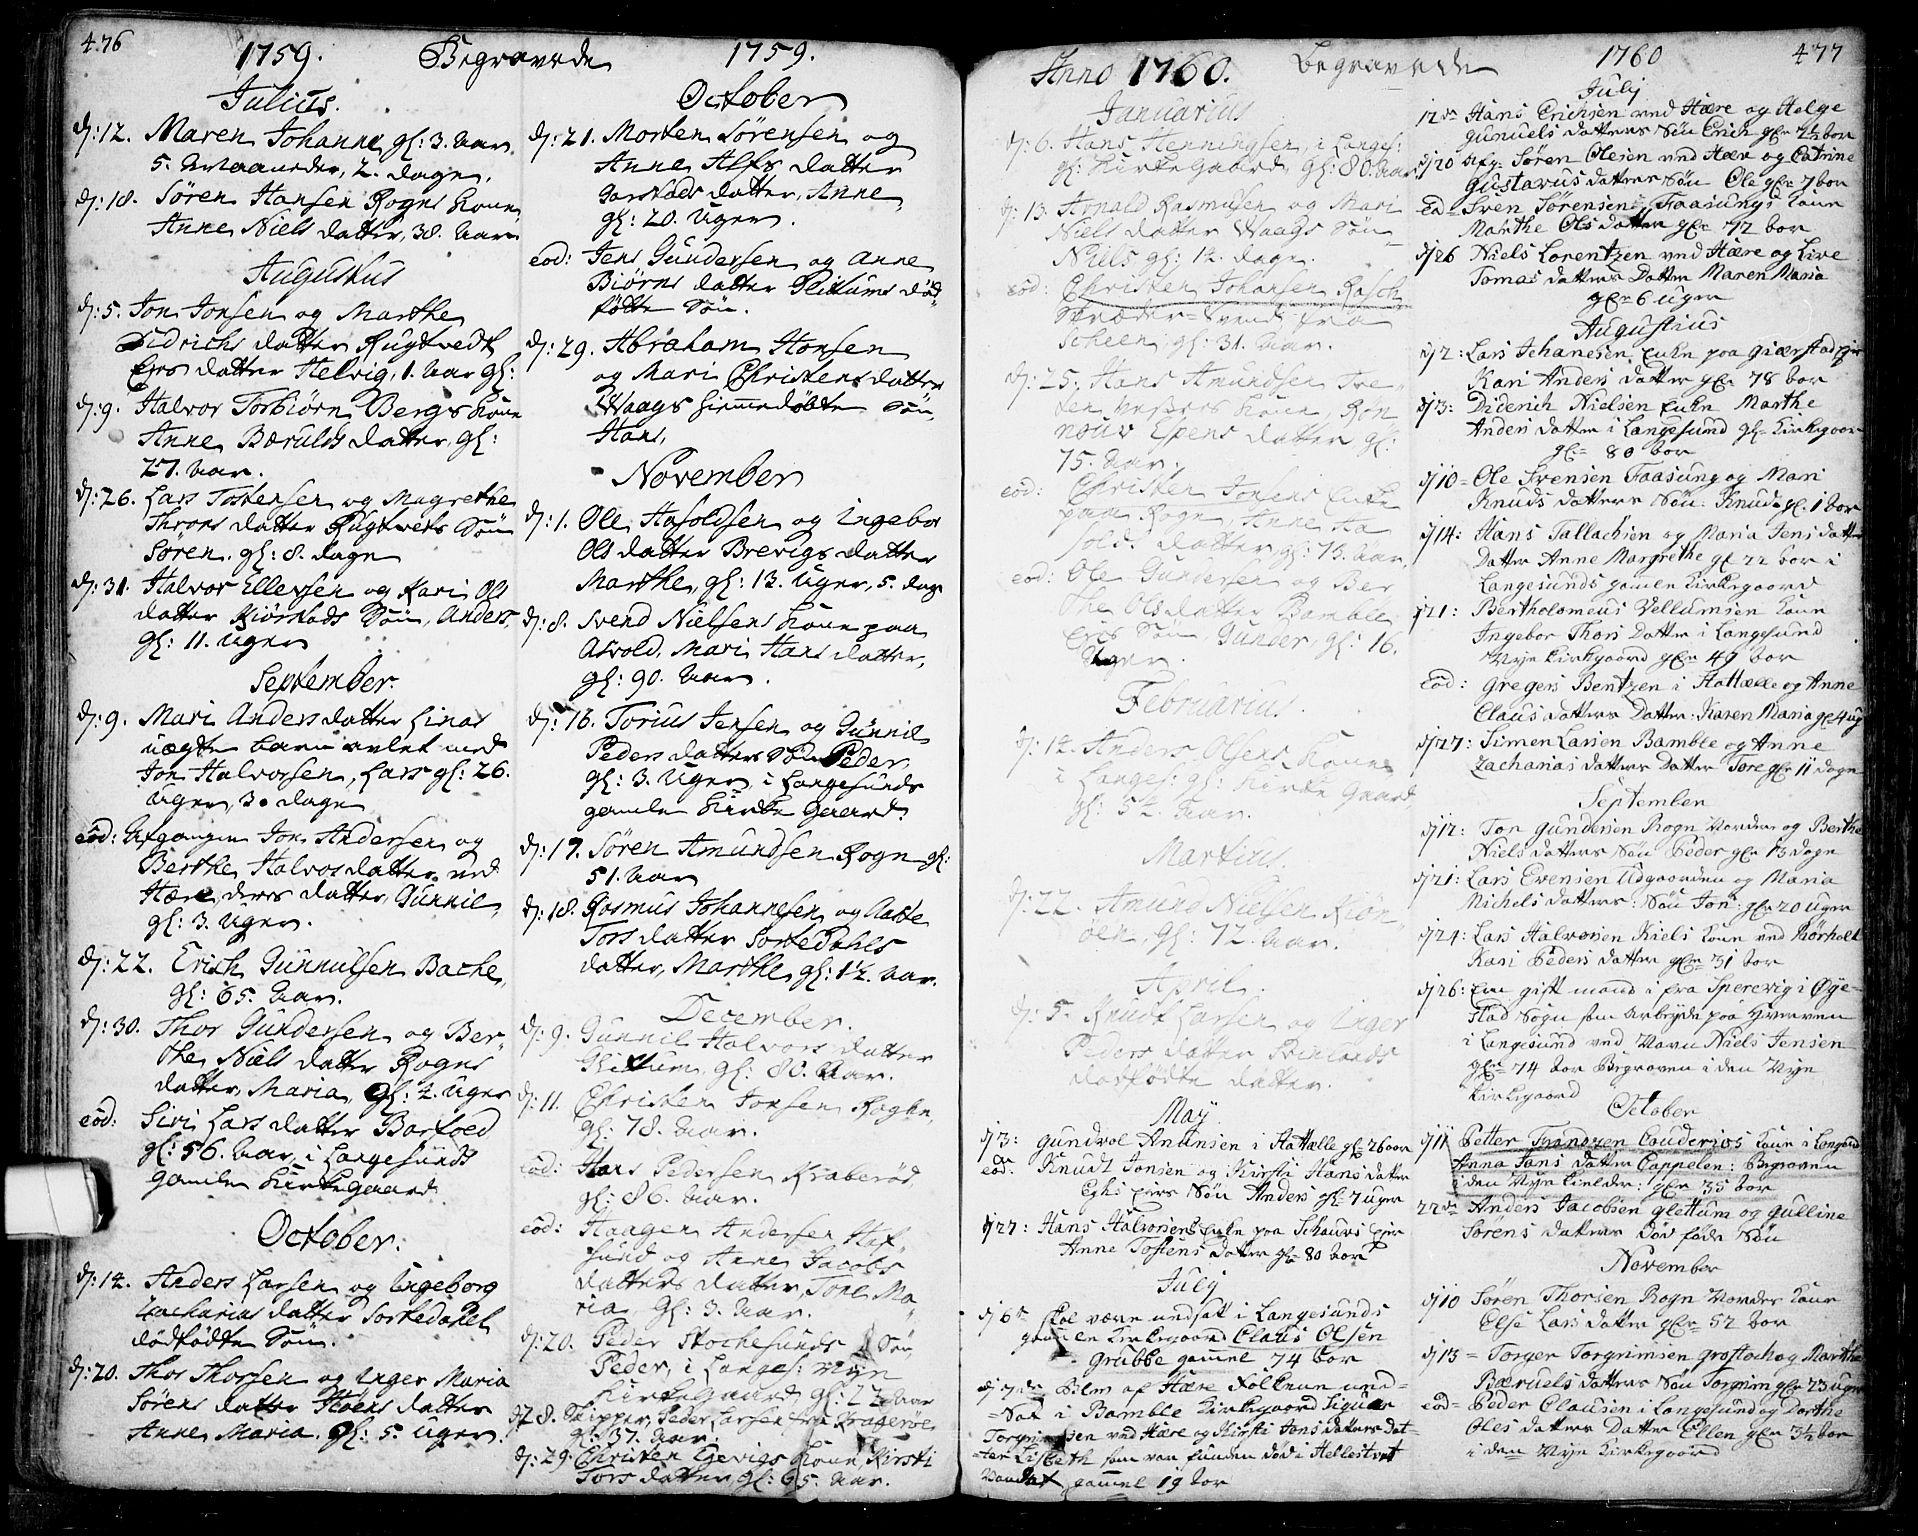 SAKO, Bamble kirkebøker, F/Fa/L0001: Ministerialbok nr. I 1, 1702-1774, s. 476-477